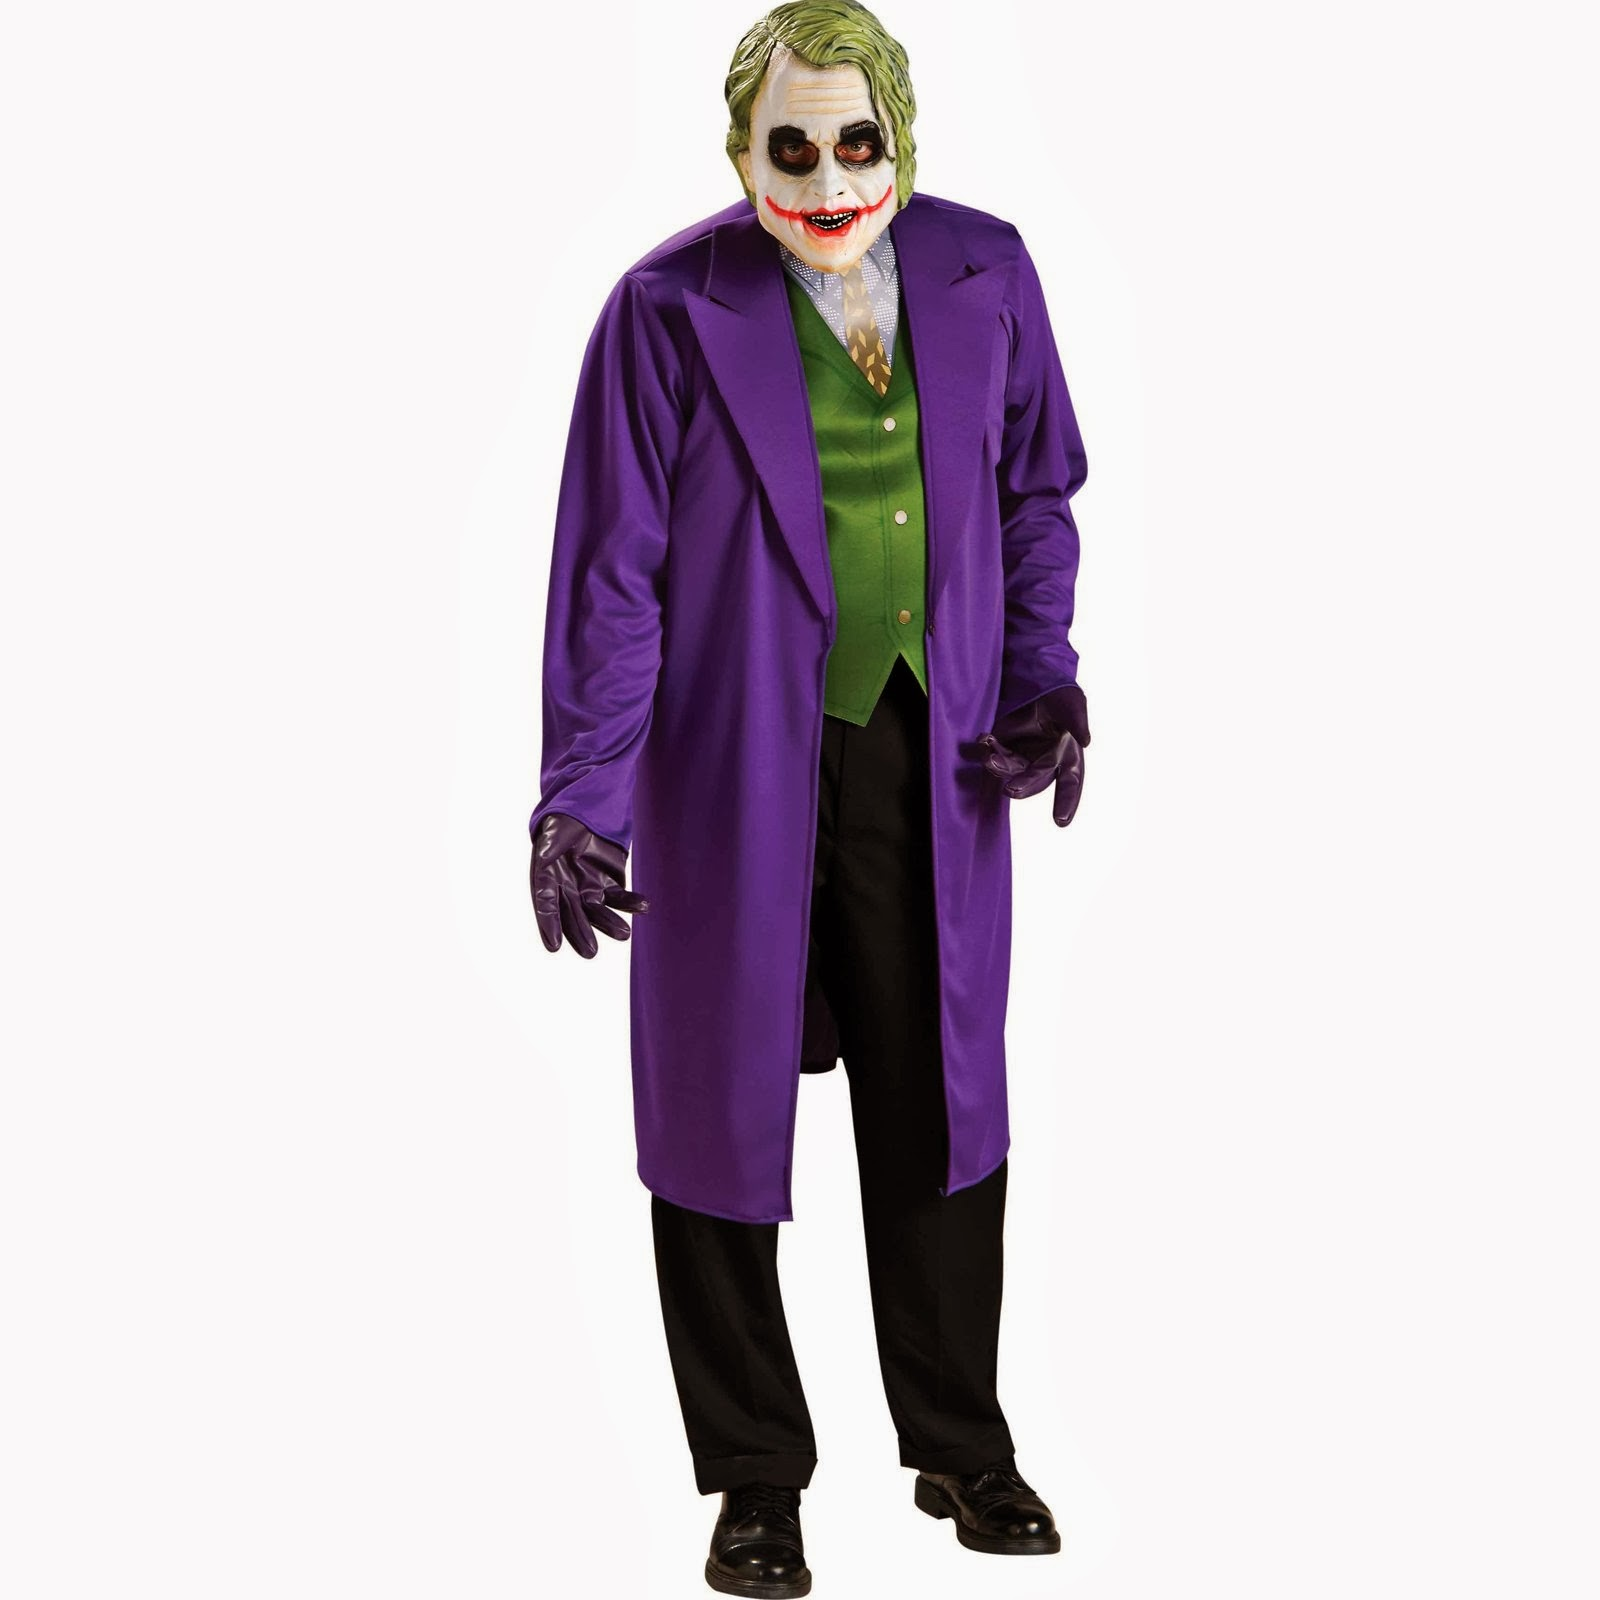 Hd Wallpapers Blog: Halloween Costumes For Men